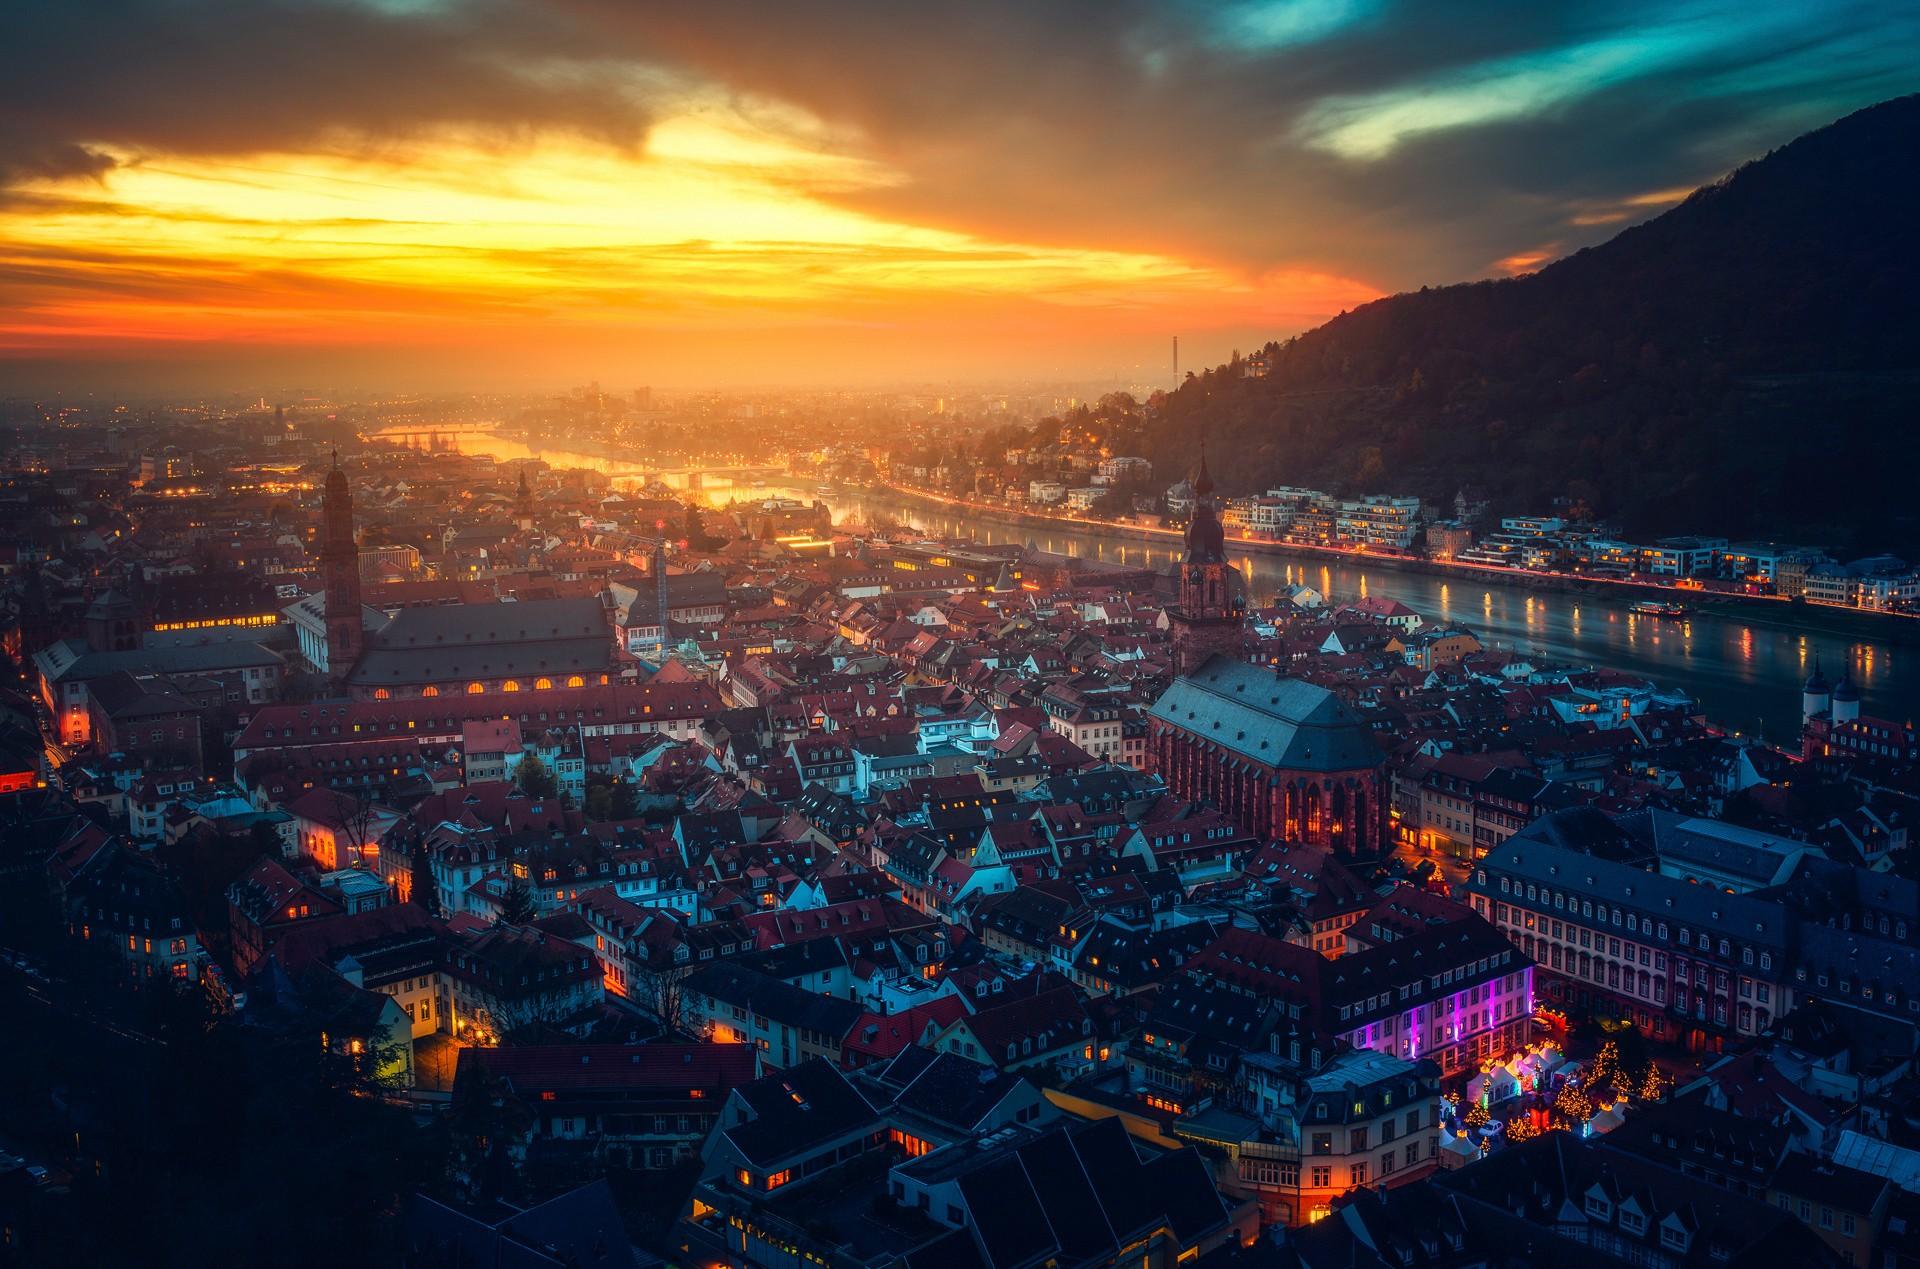 General 1920x1269 cityscape river castle mountains sunlight Germany Heidelberg city sunset